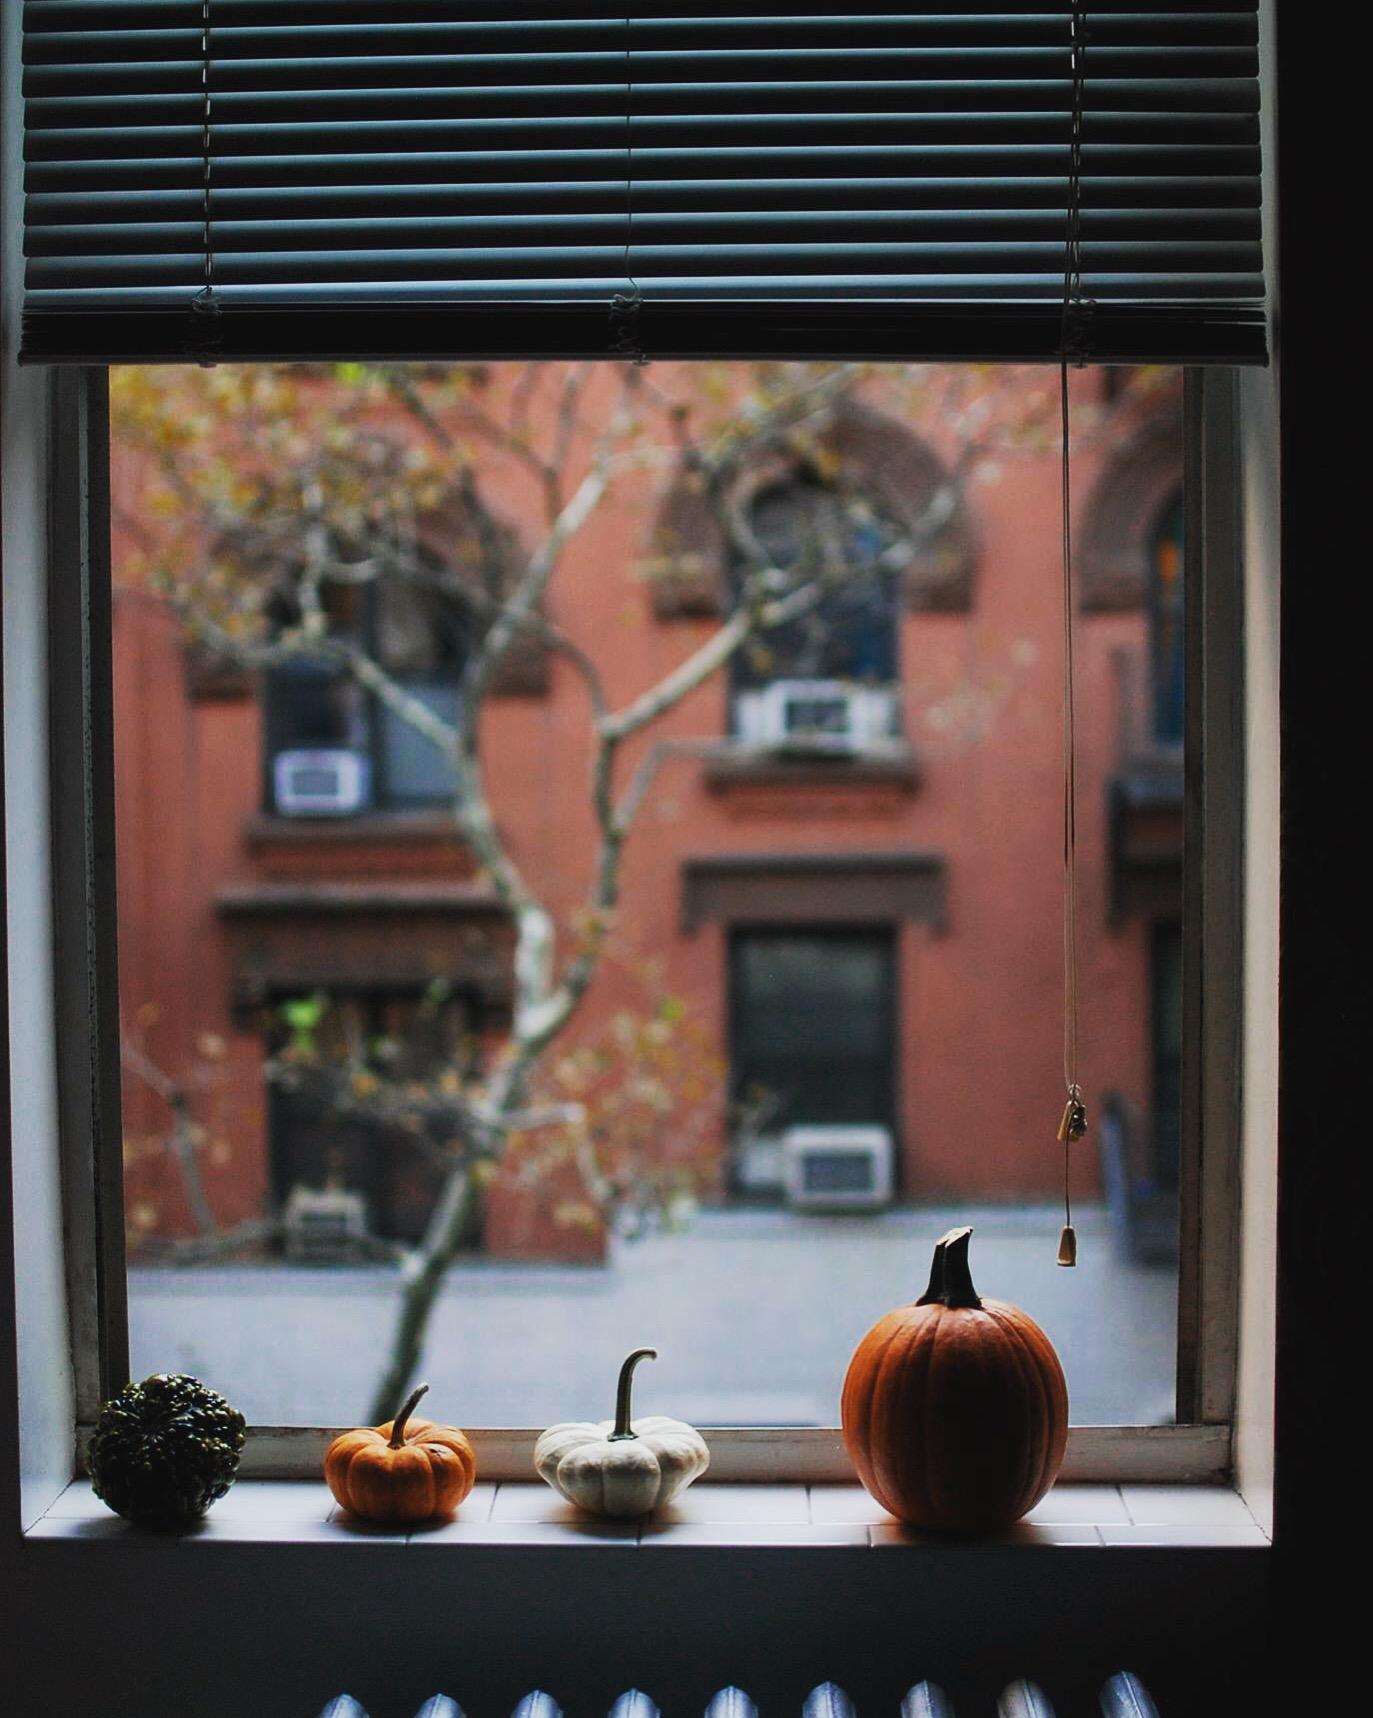 Happy October. TBT Oct 1, 2015 6